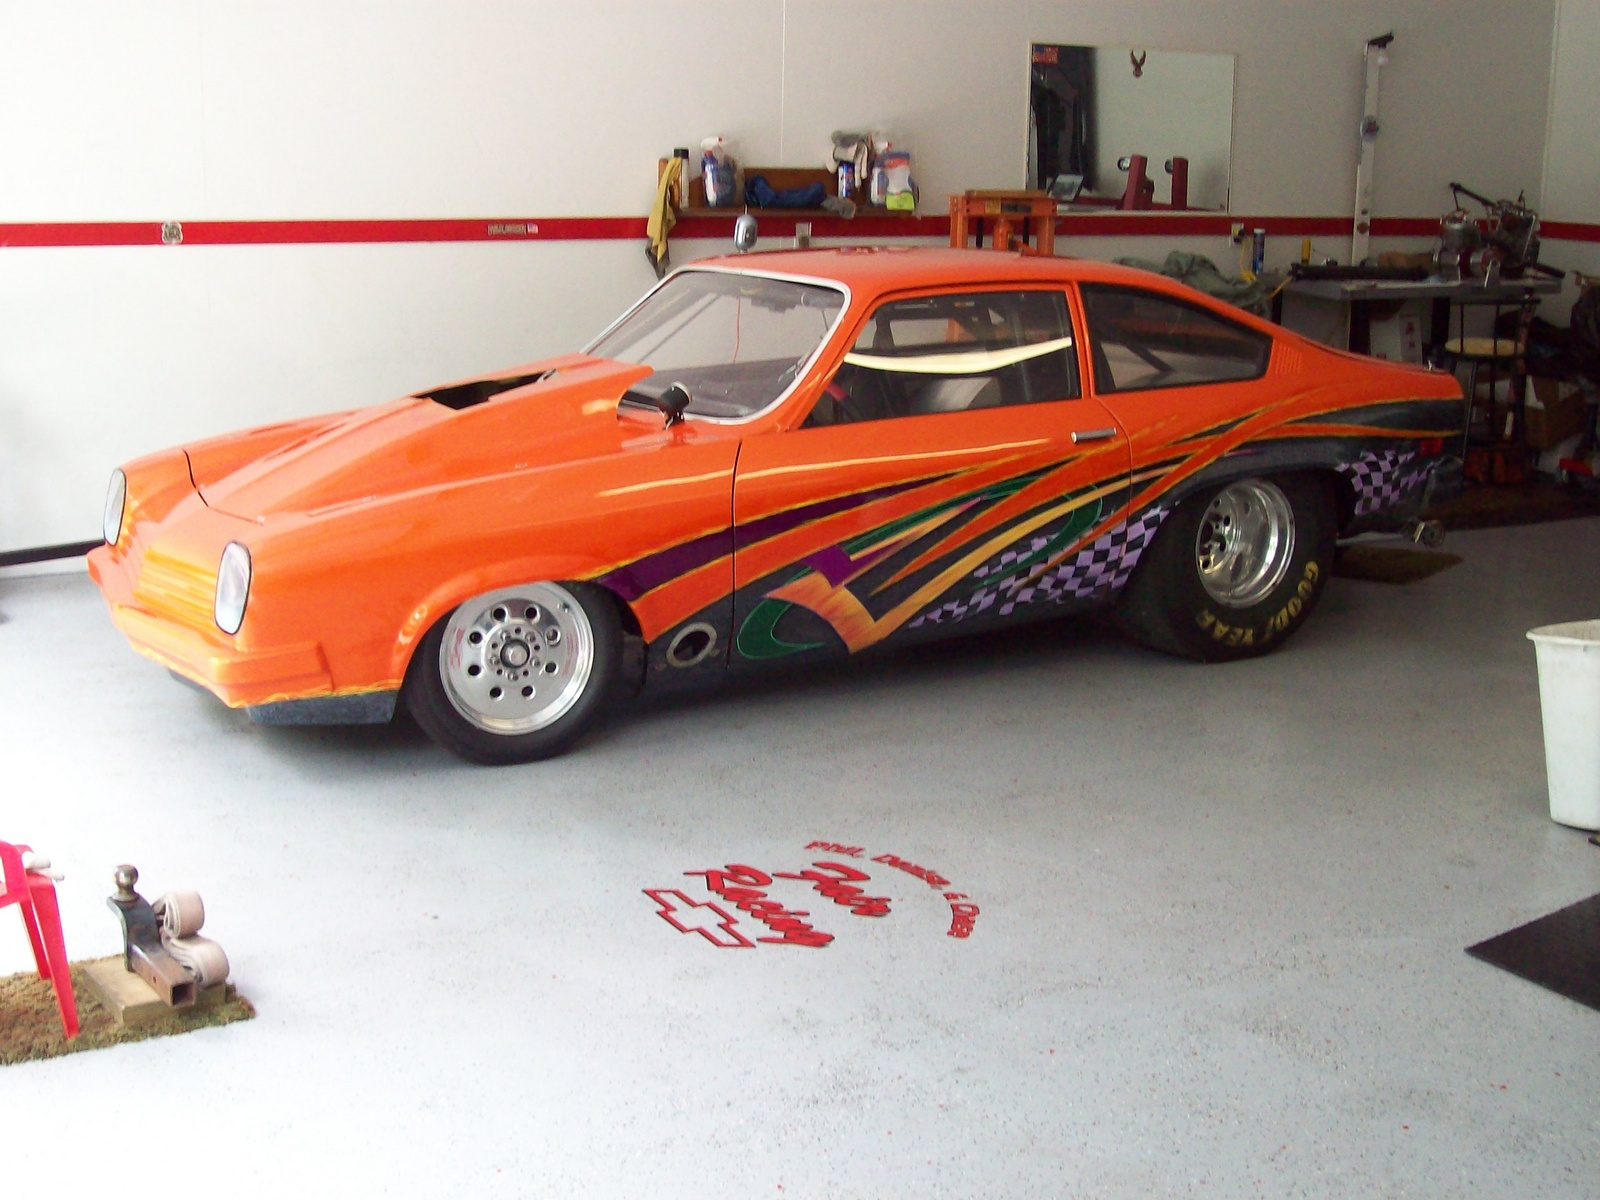 Chevy Vega Race Cars - Cars Image 2018